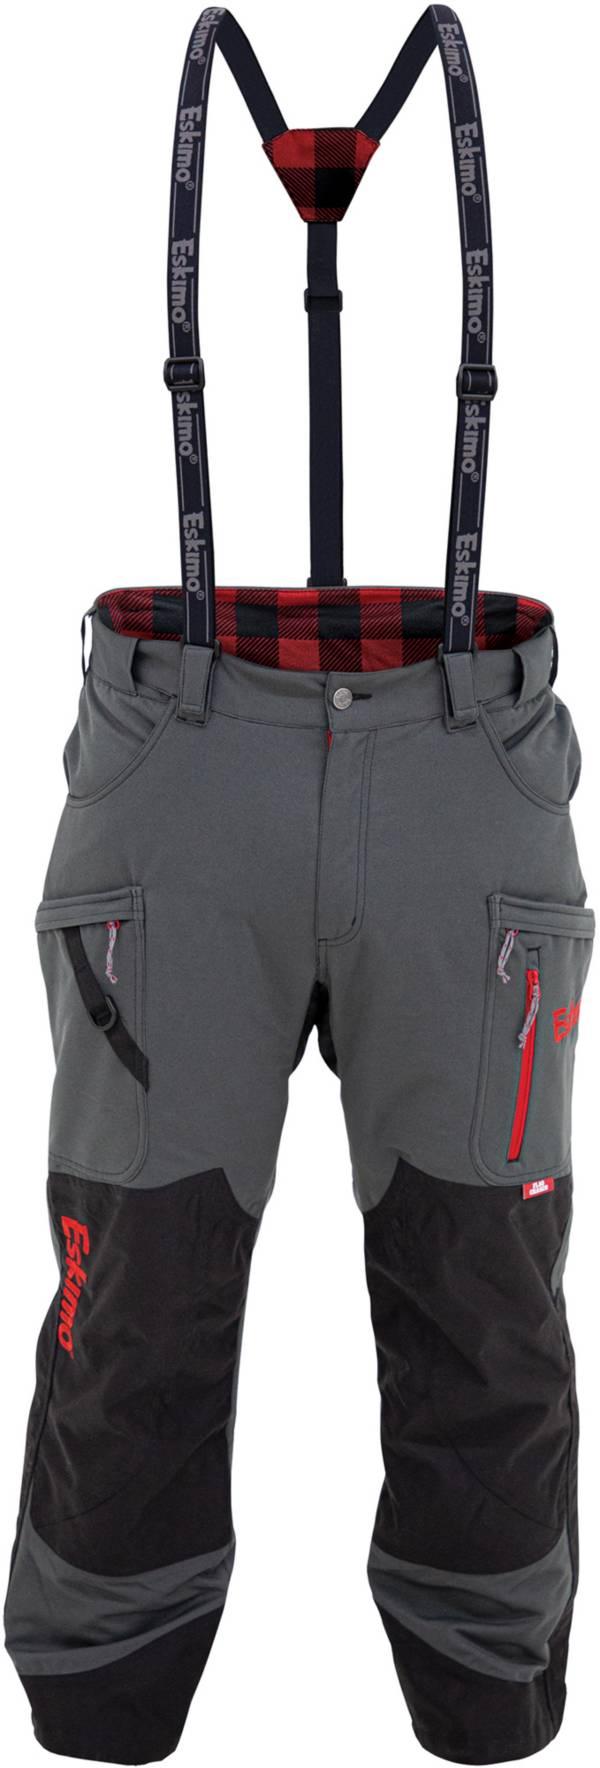 Eskimo Men's Flag Chaser Pants product image